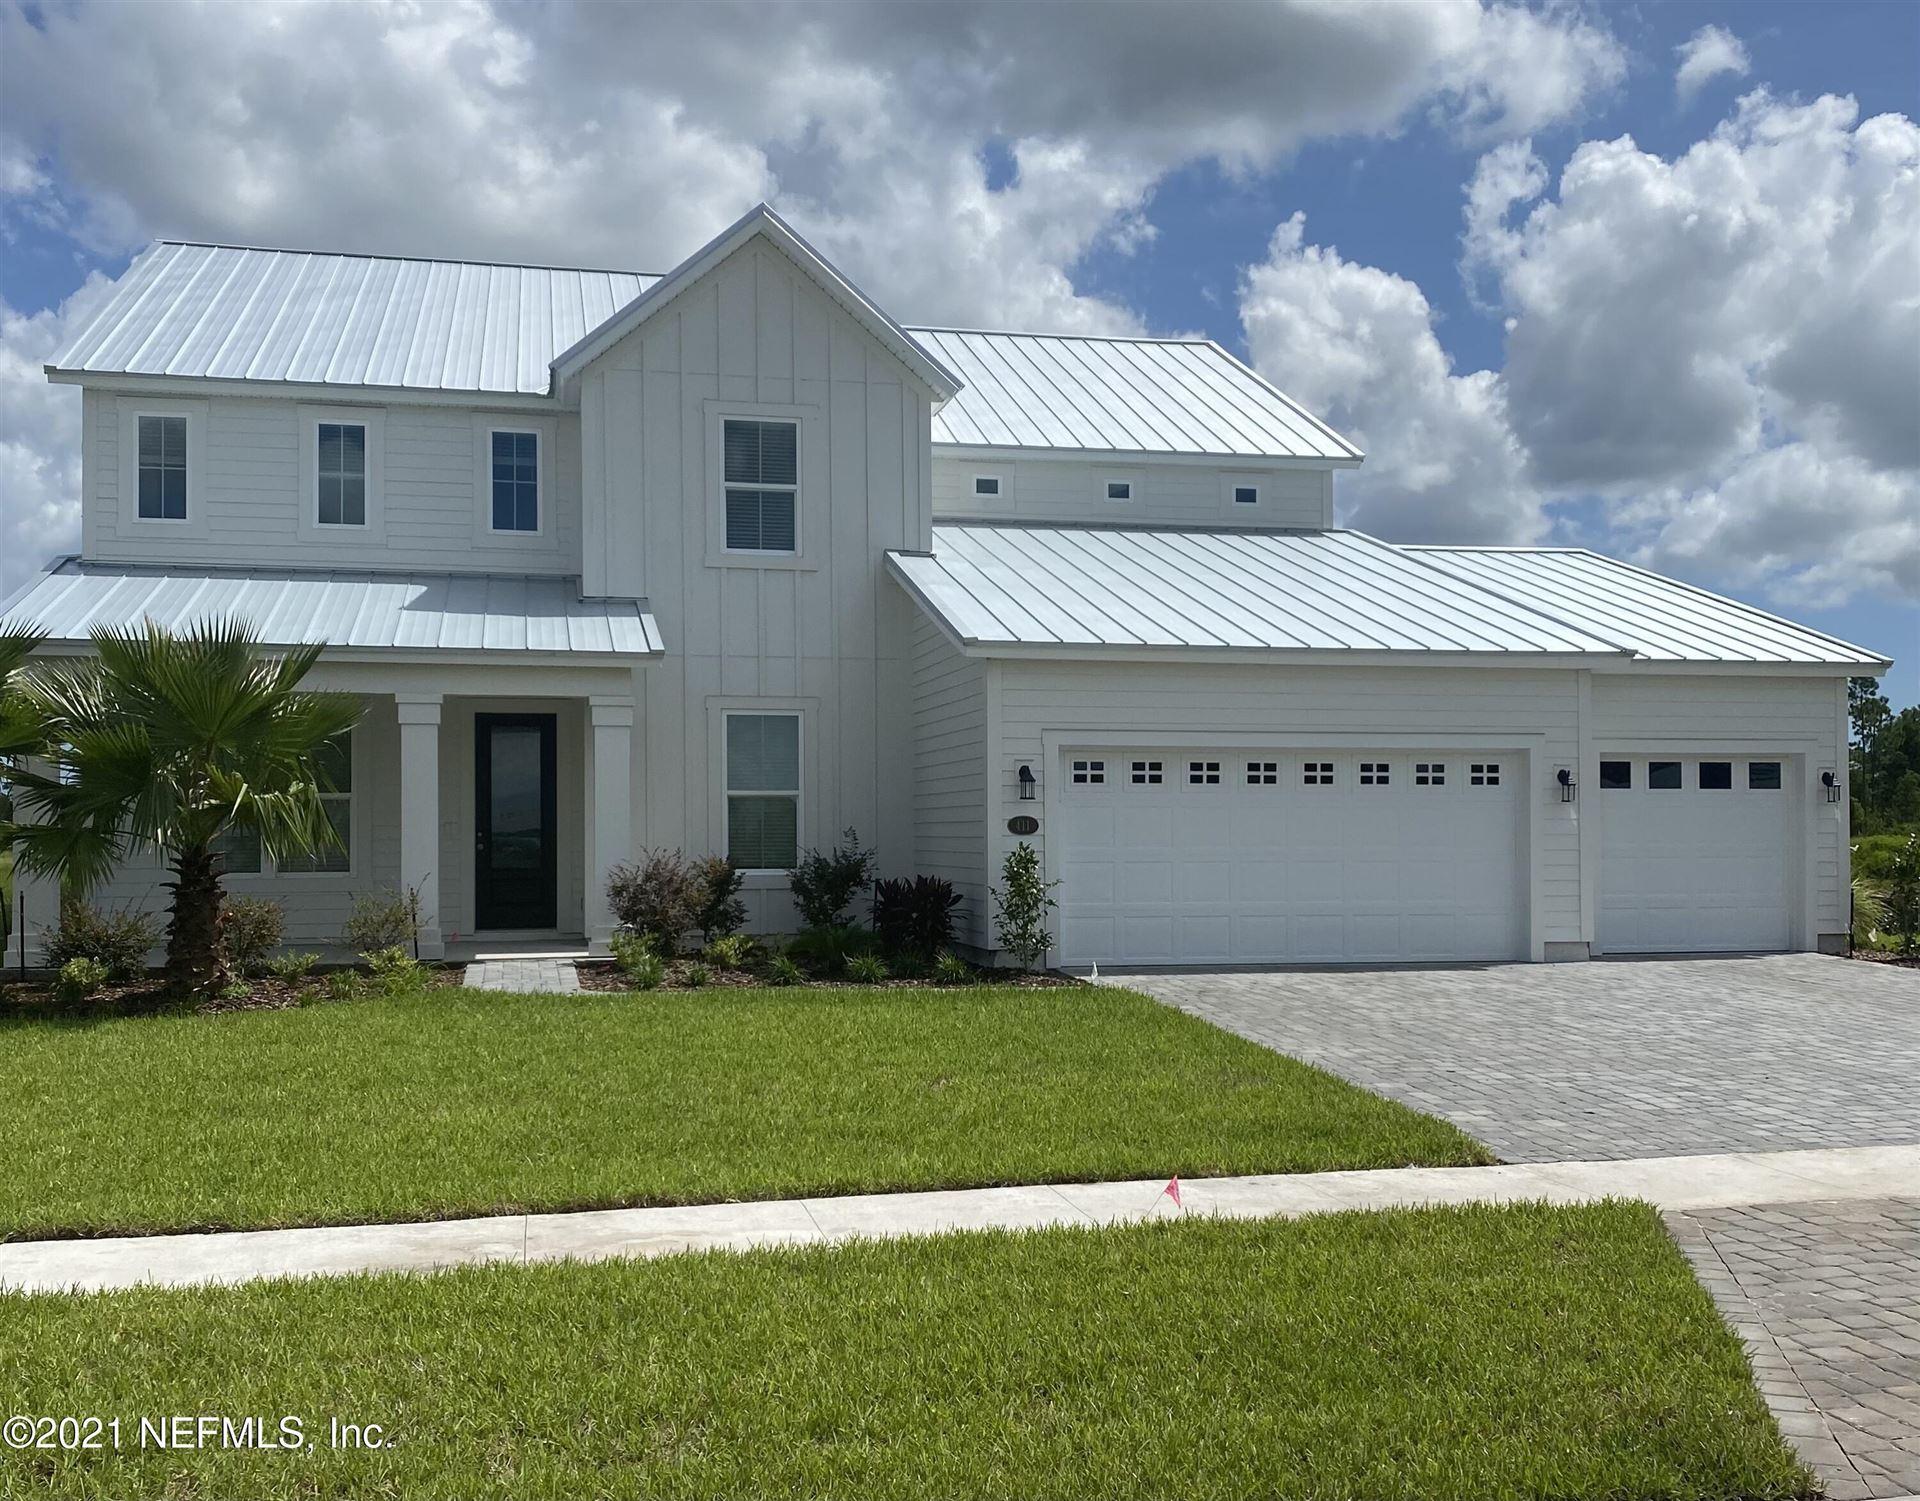 189 TOPSIDE DR #Lot No: 010, Fruit Cove, FL 32259 - MLS#: 1123338